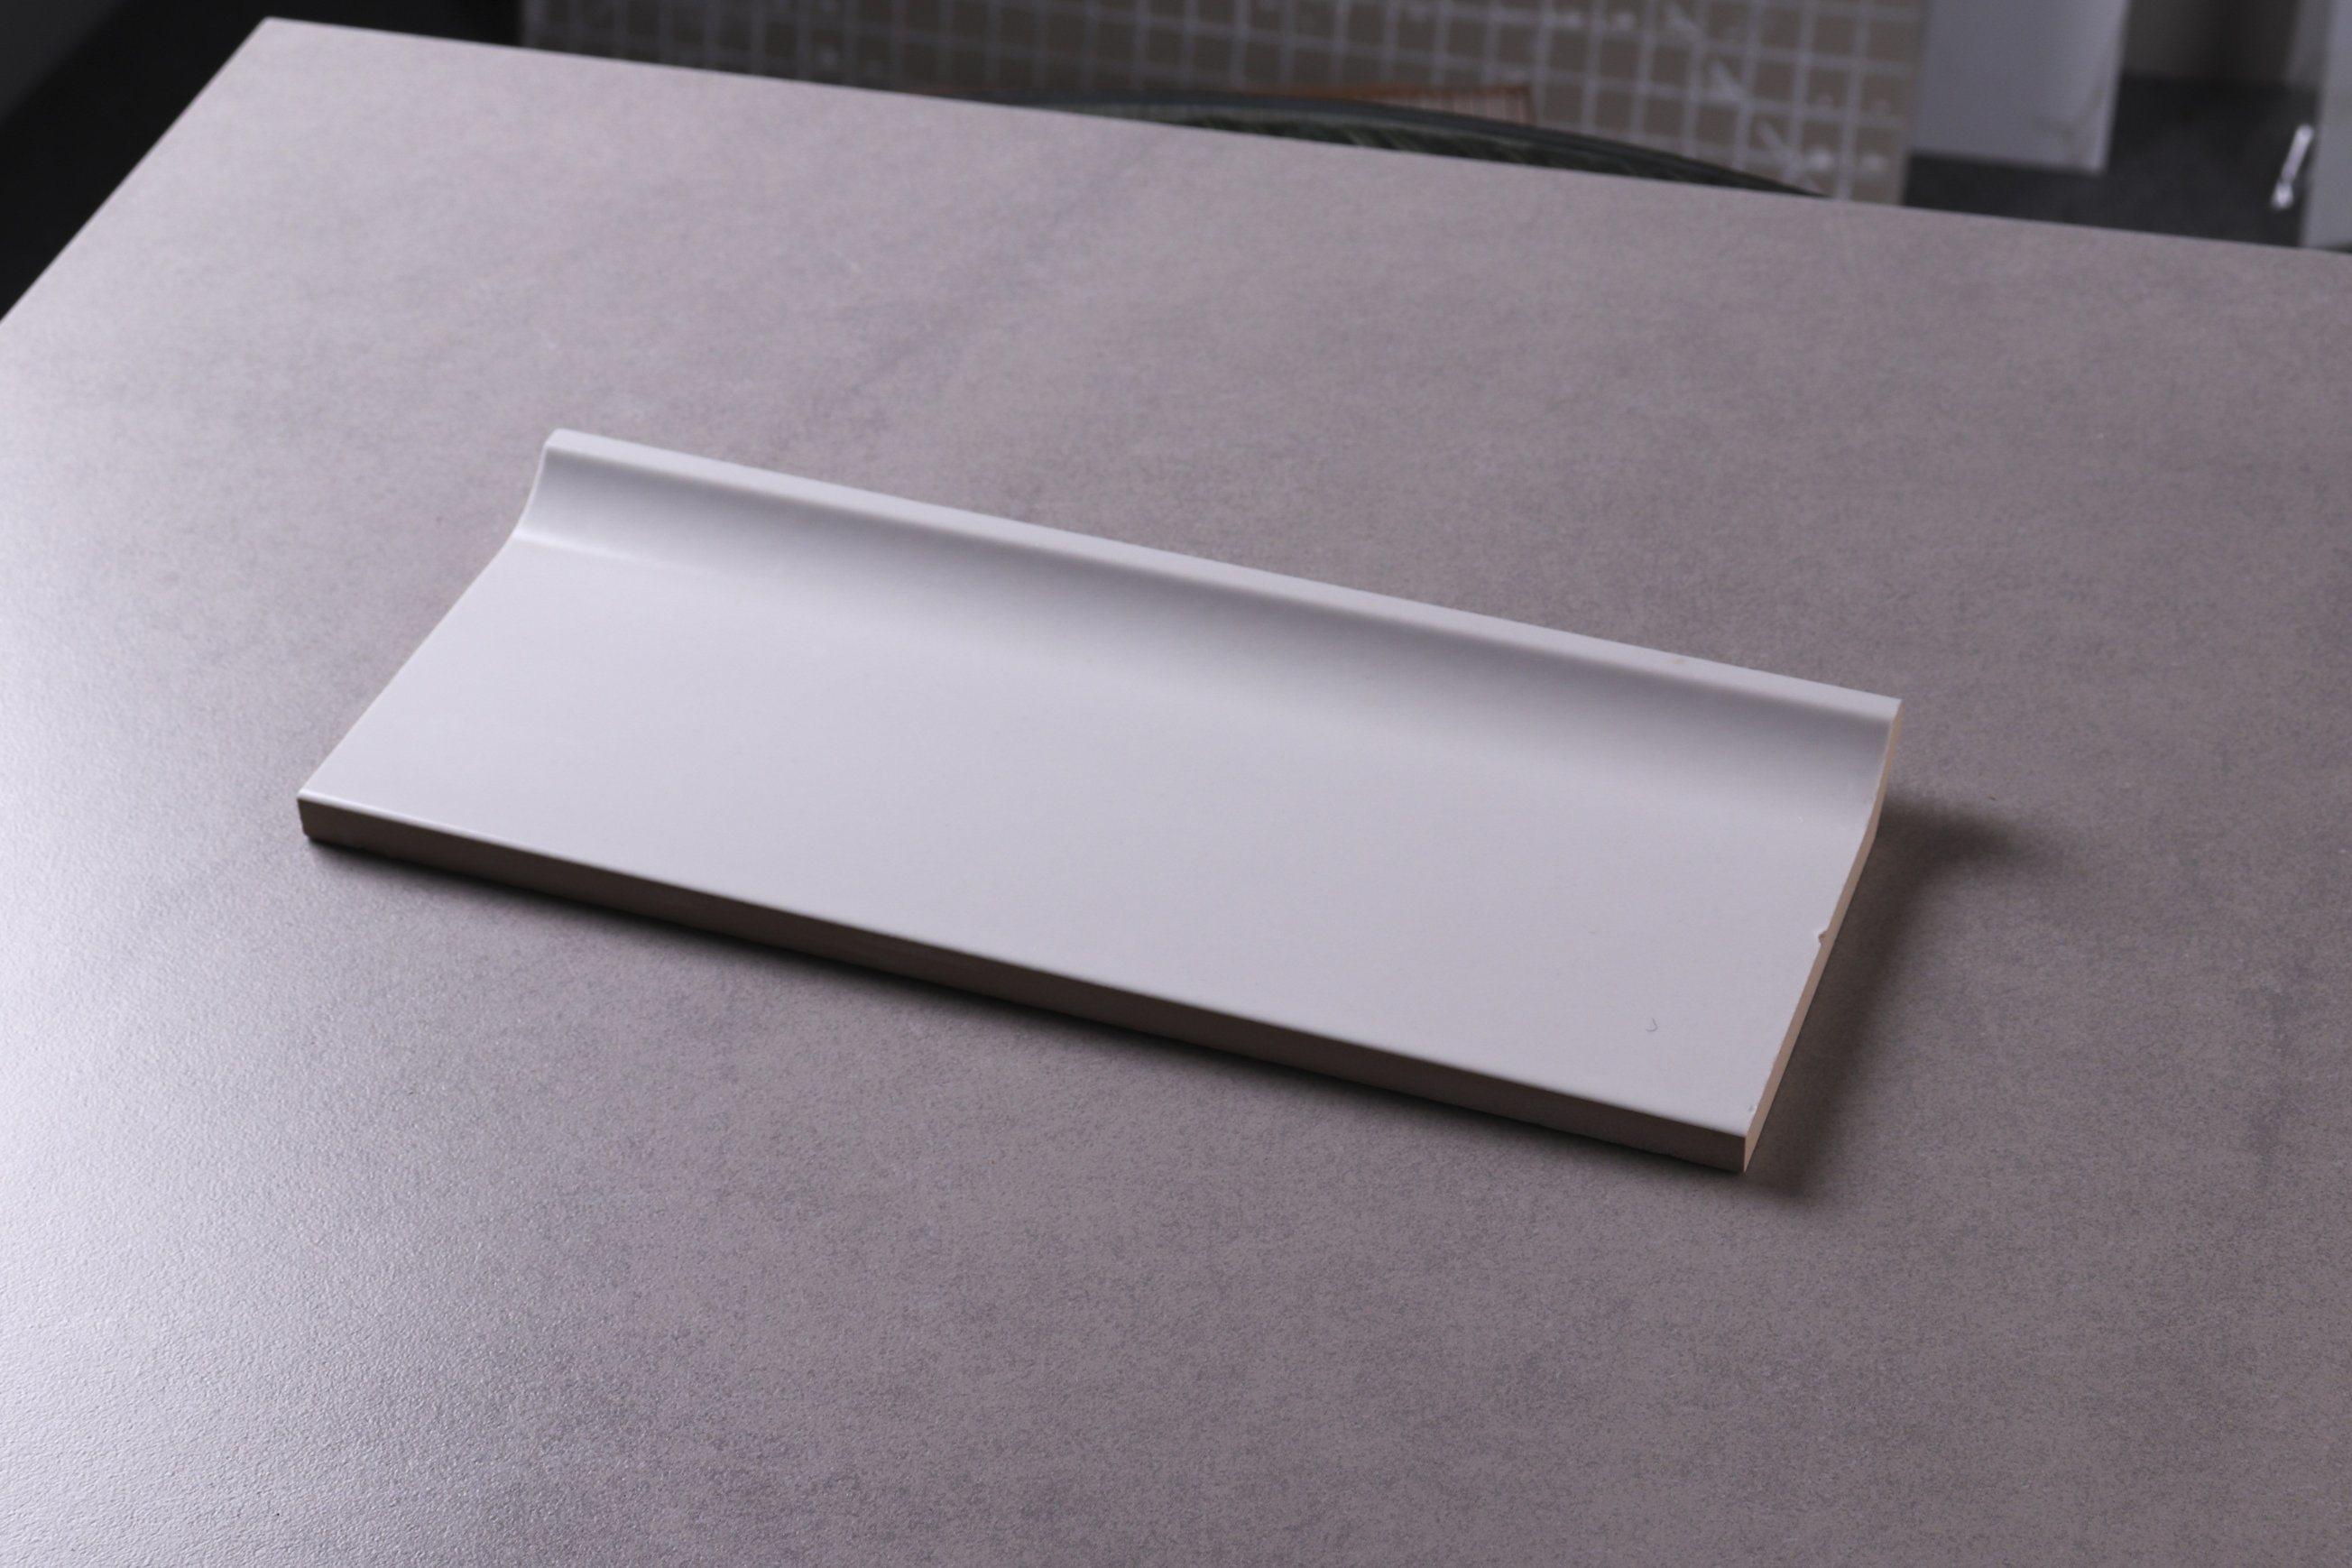 hot item jla 100x300 white bathroom inside corner brick tile accessories cove base skirting trim